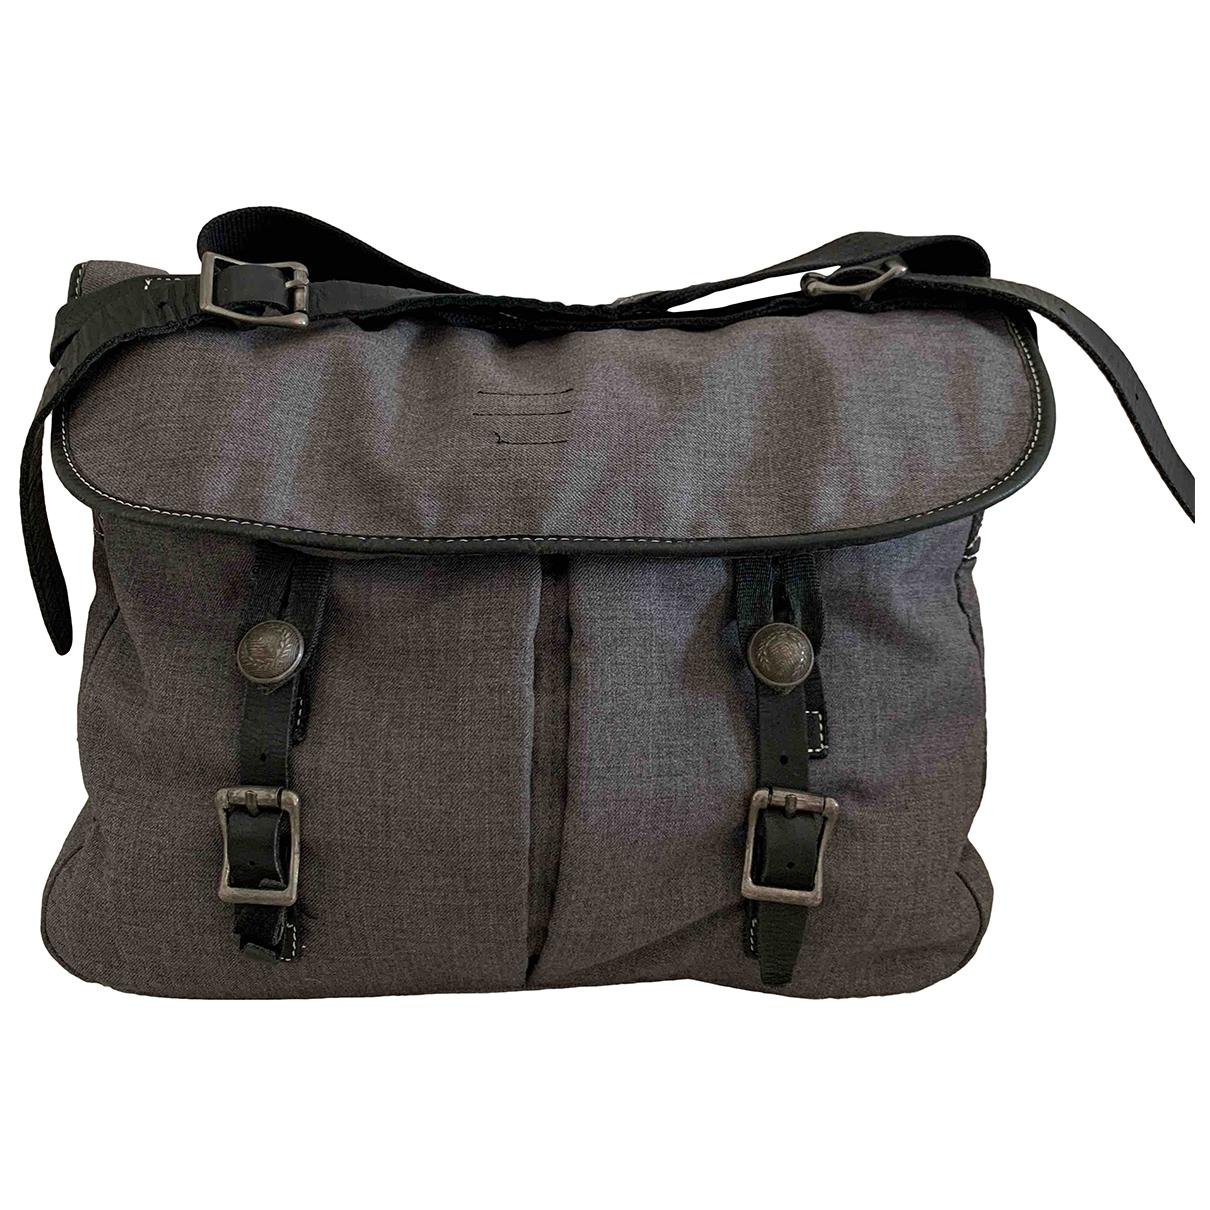 Fred Perry \N Taschen in  Grau Baumwolle